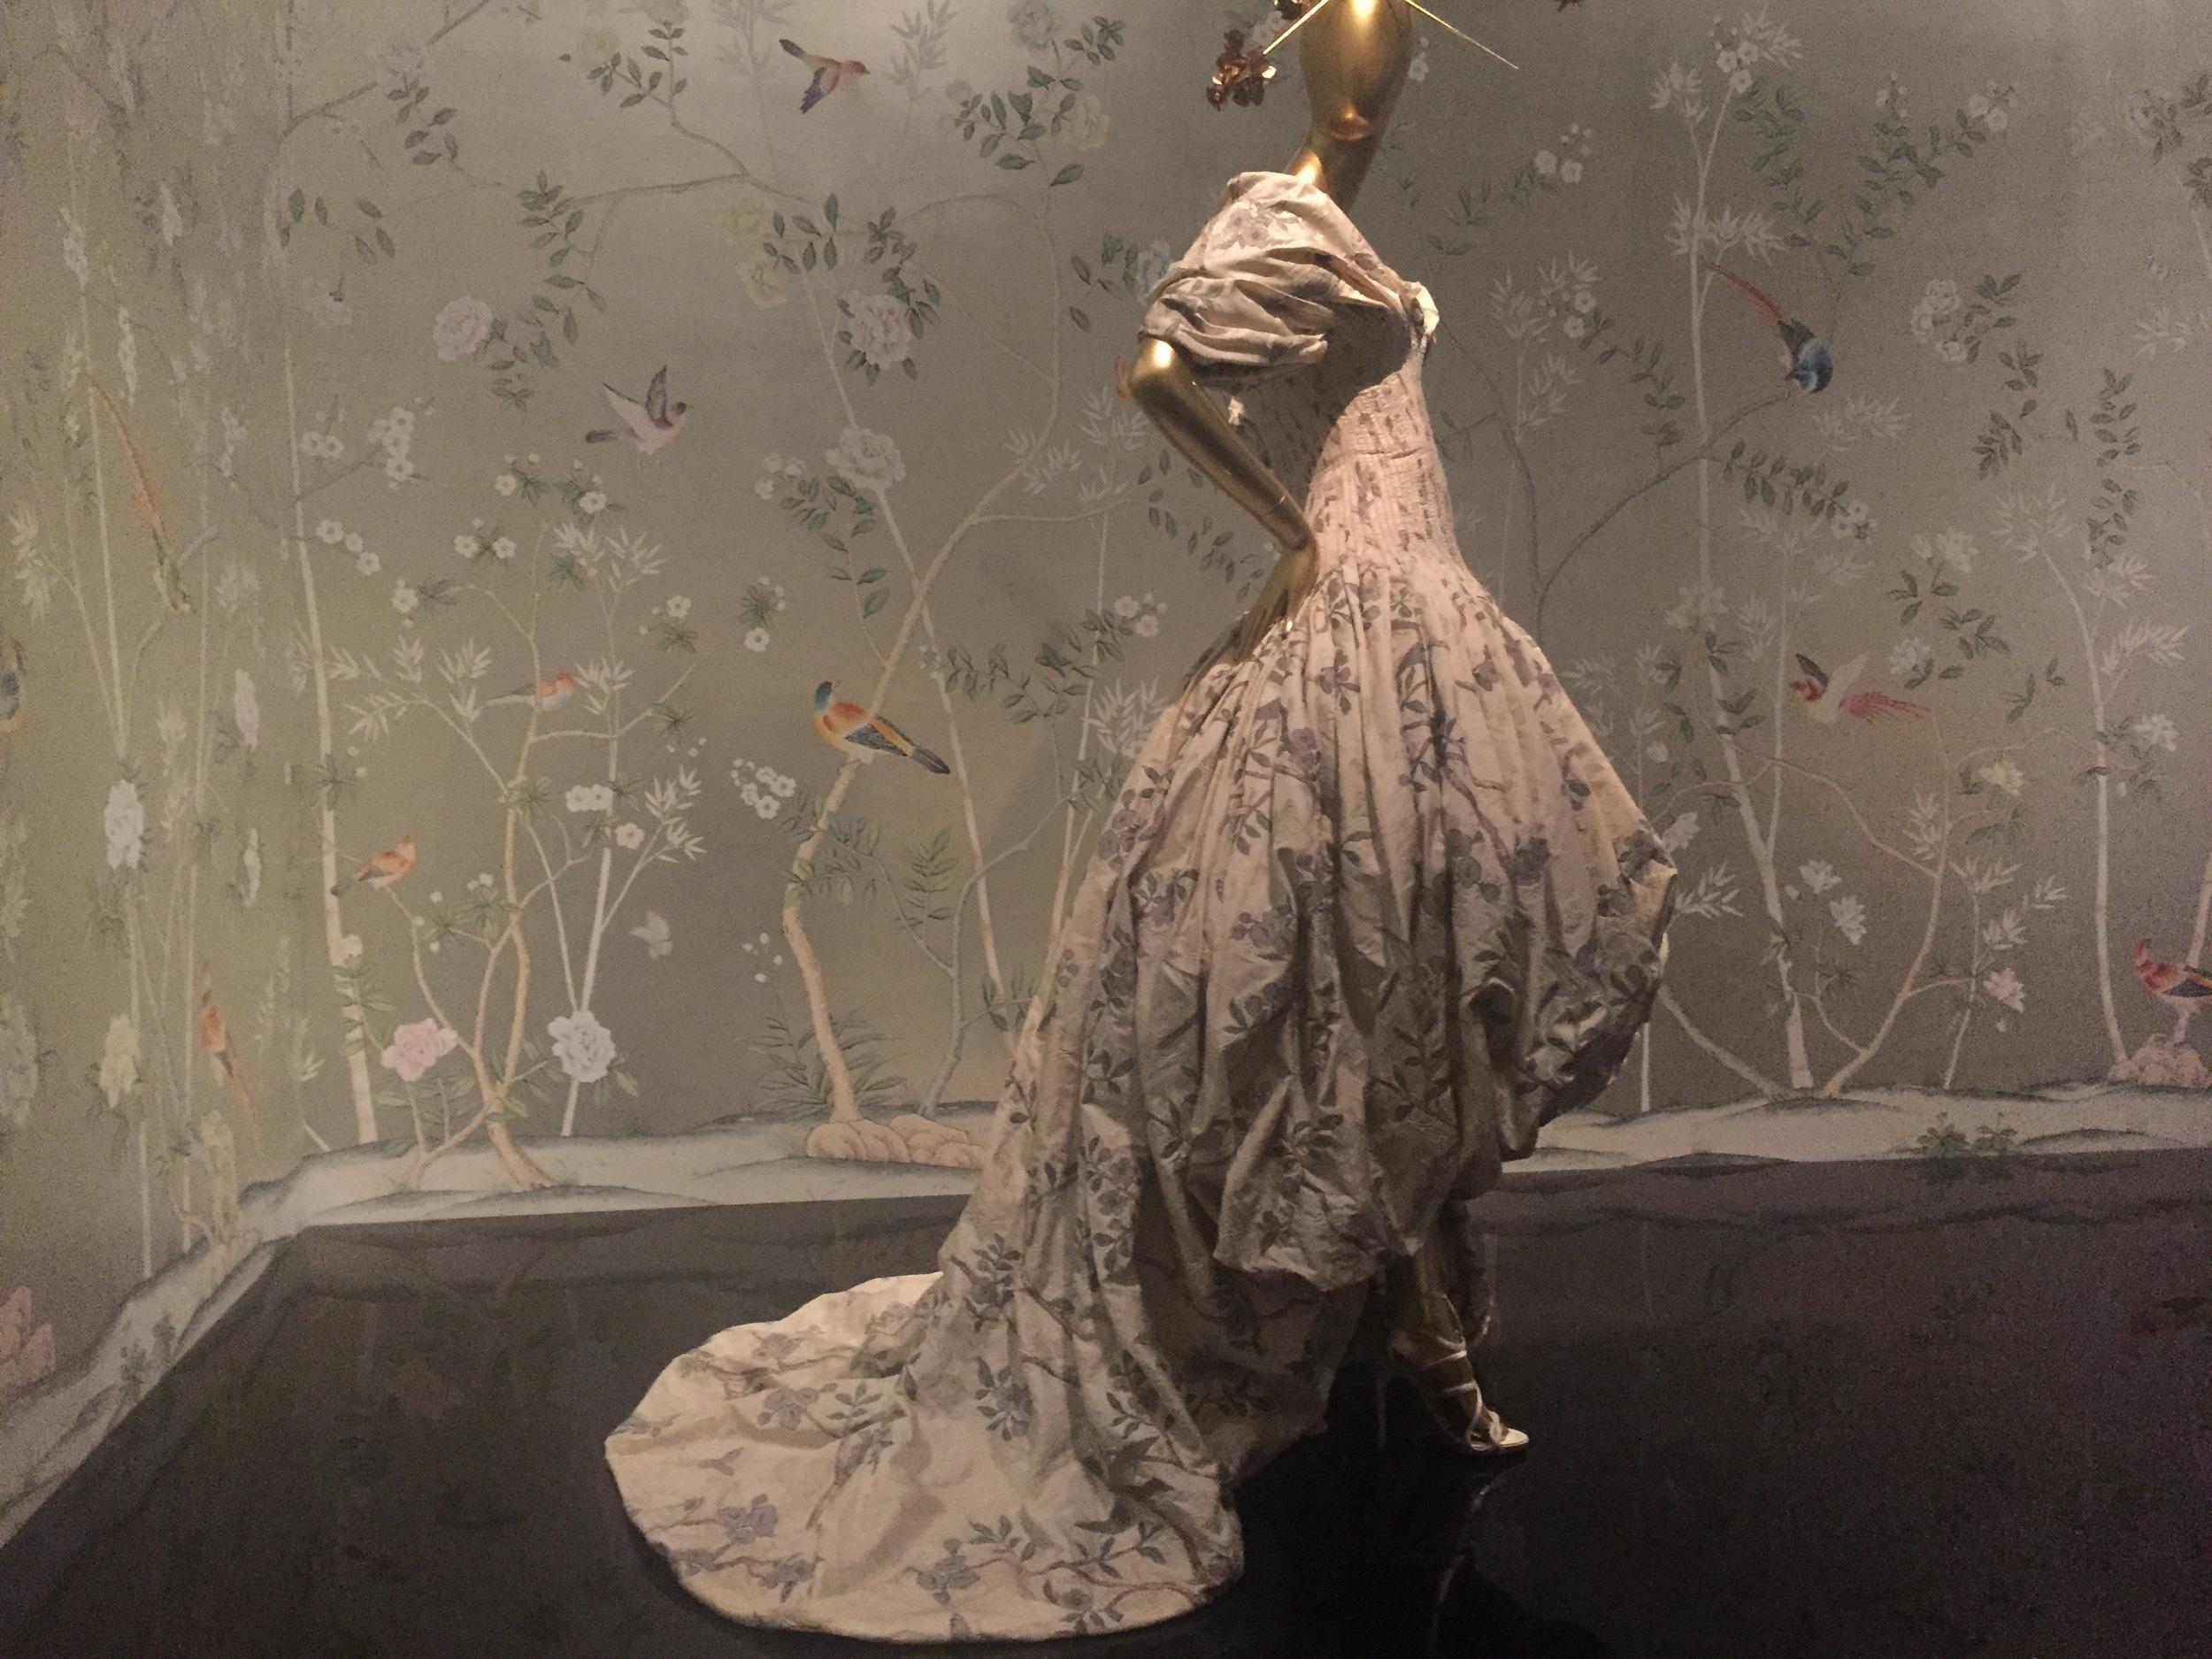 """China Through the Looking Glass, Metropolitan Museum of Art NYC 2015"" Photo:Kimberly Charles"